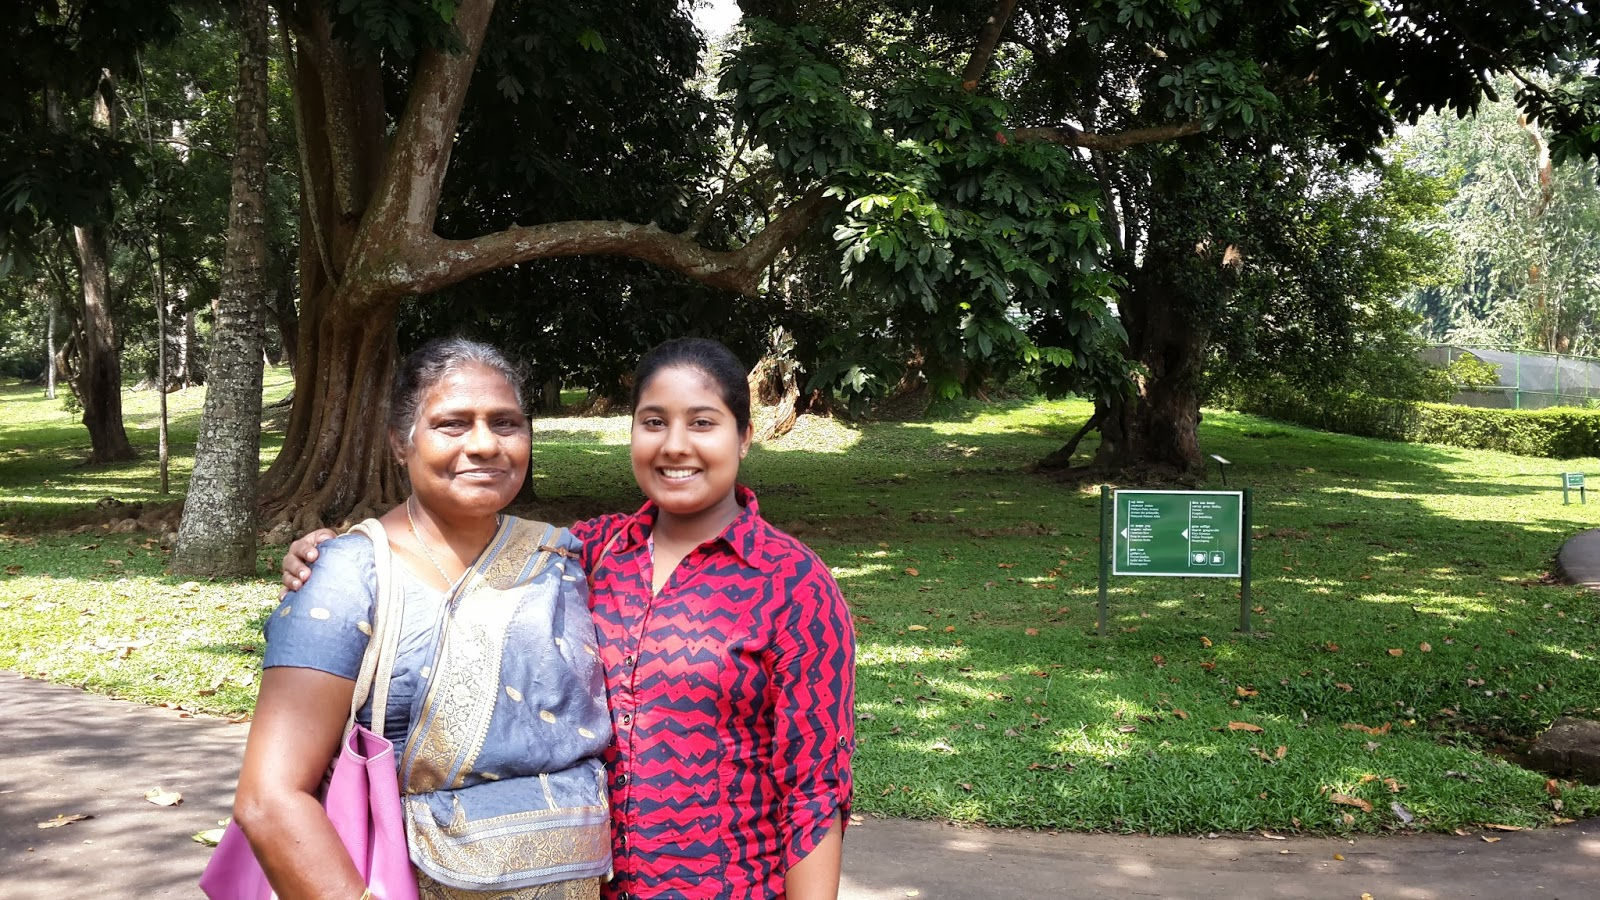 Sri friends in lanka pen female Maha Nuwara